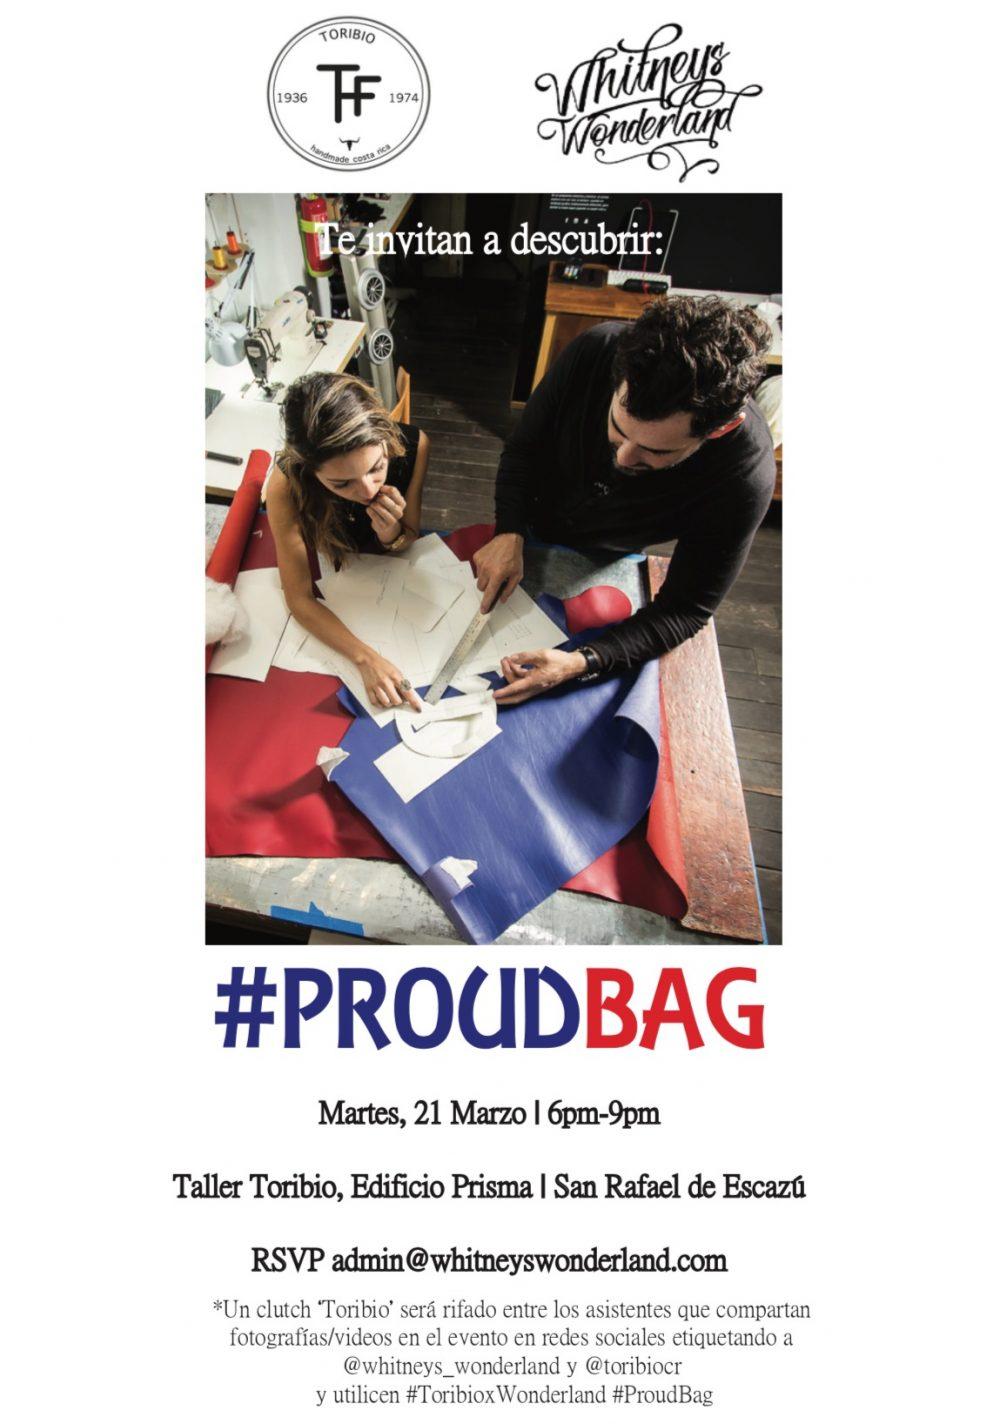 Toribio x Wonderland Costa Rican Fashion Design collaboration #ProudBag